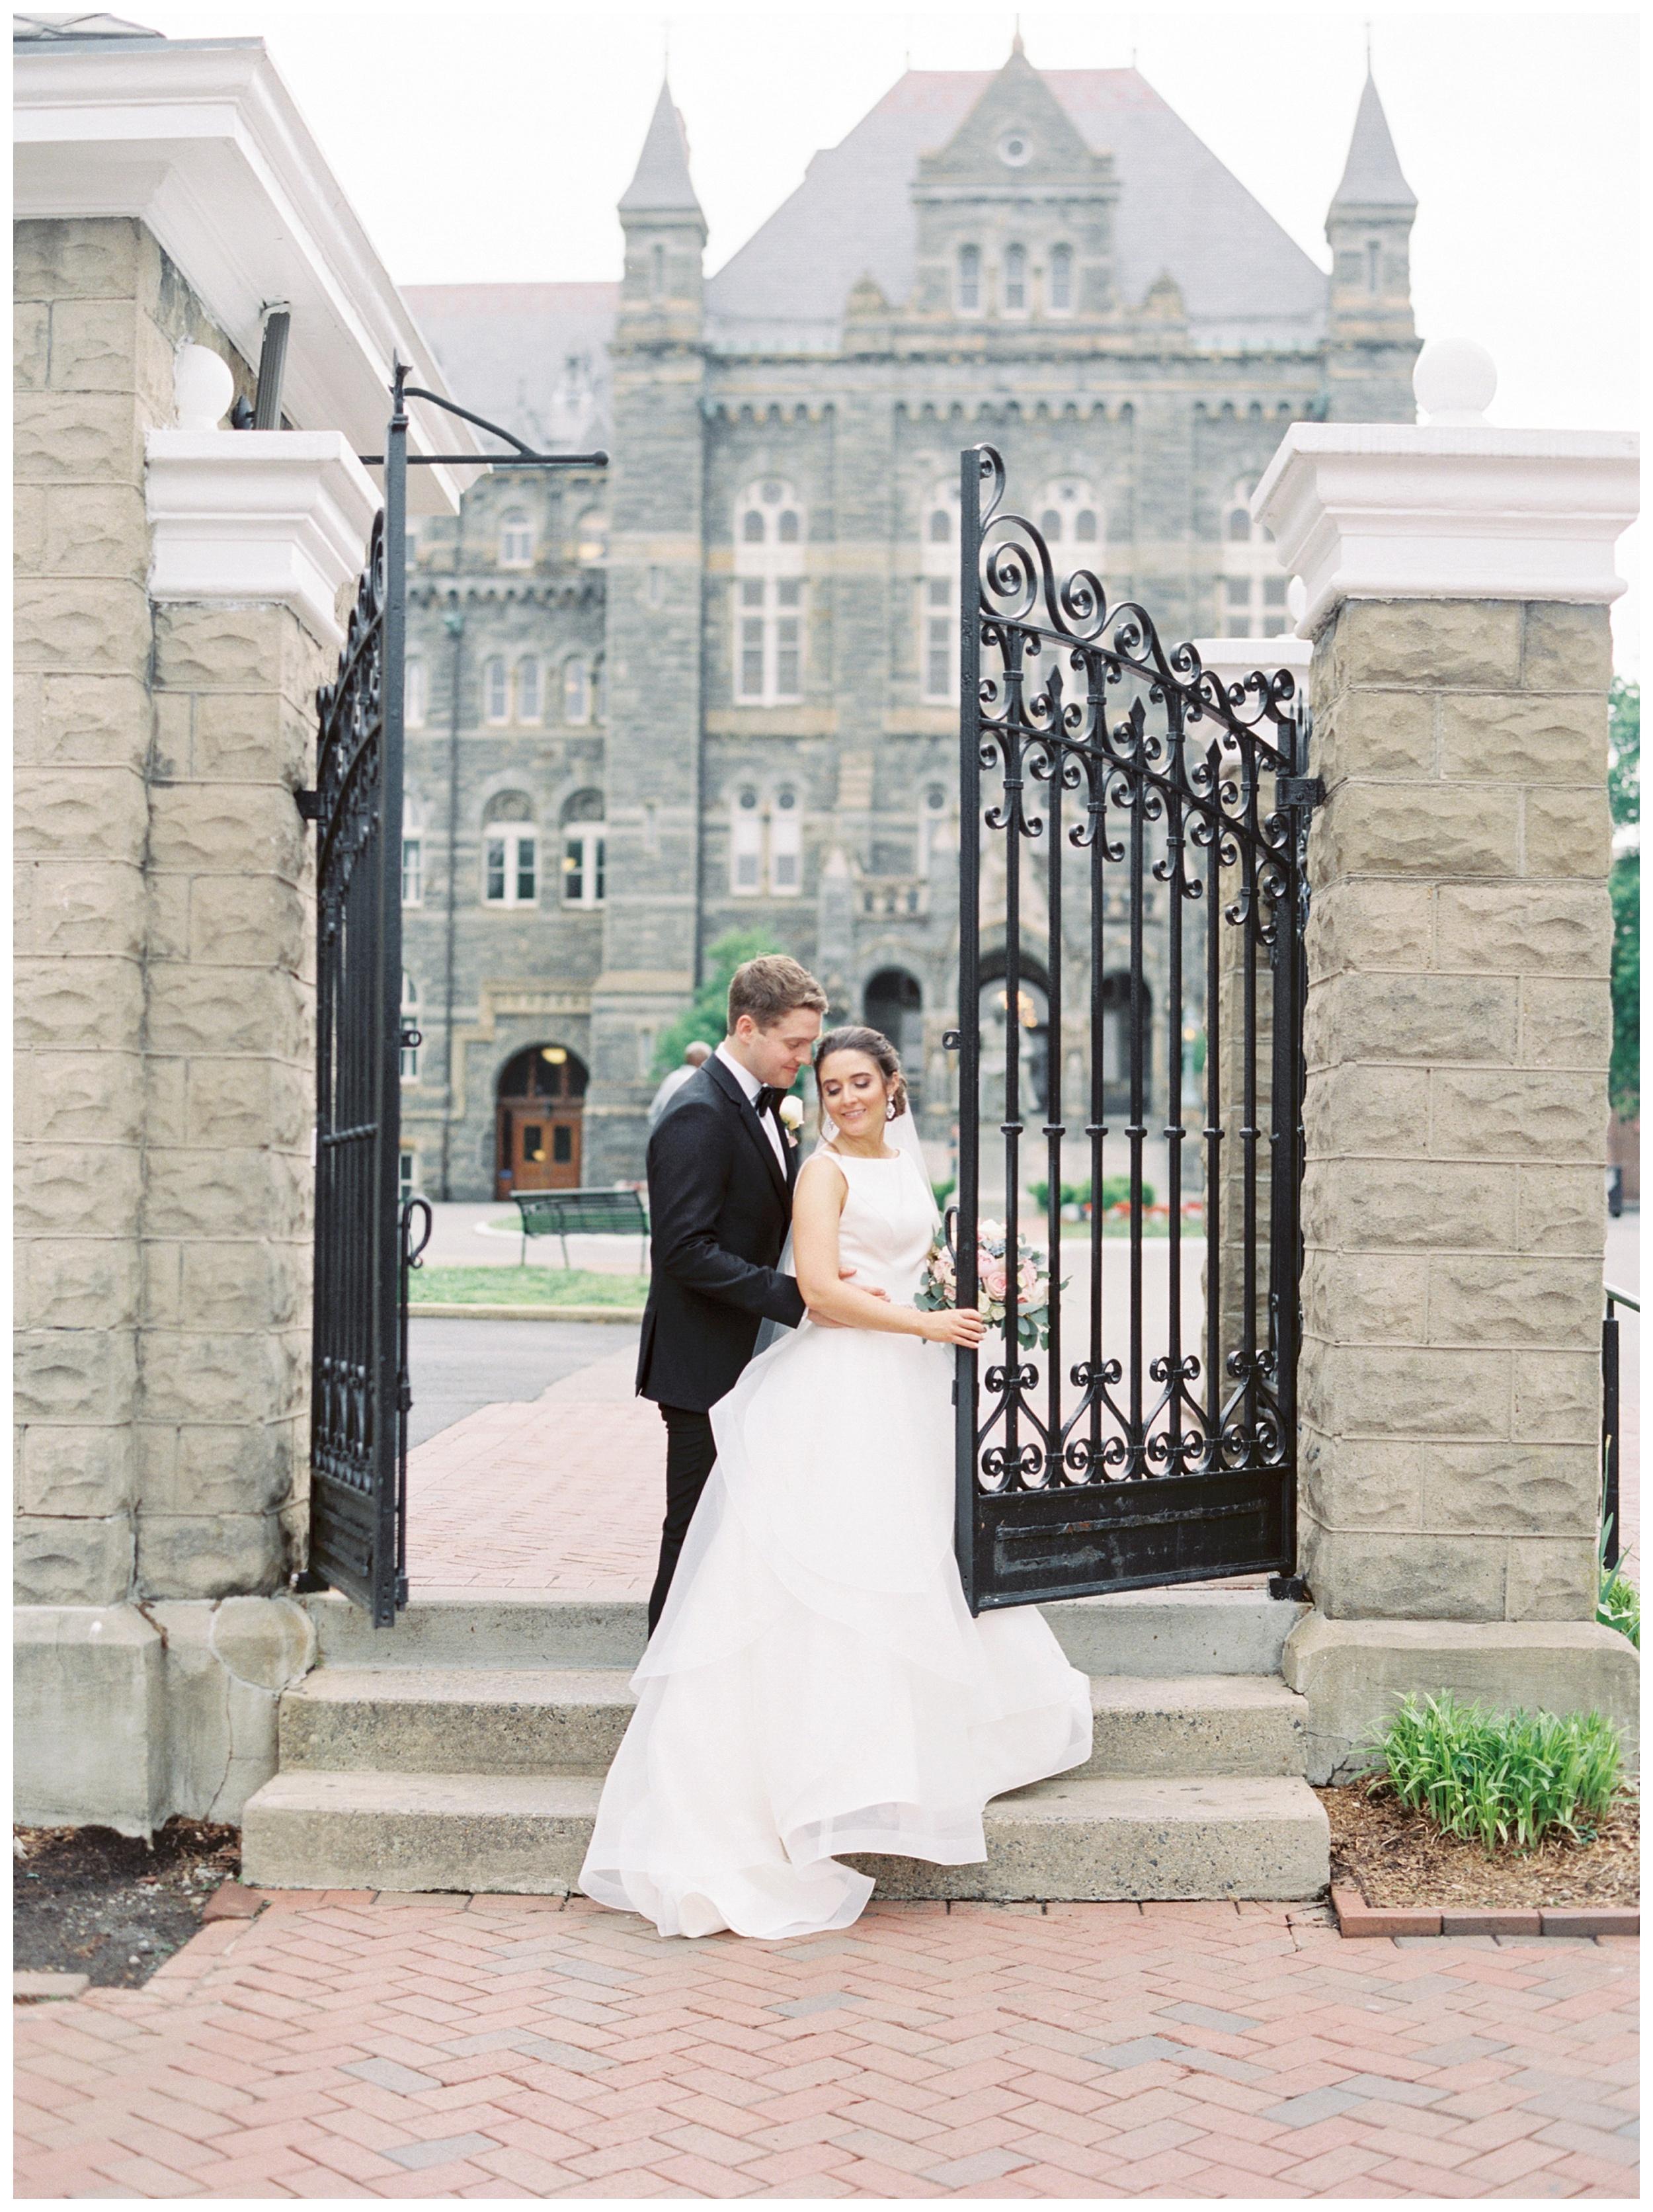 DAR Constitution Hall Wedding Wedding | Daughters of the American Revolution Wedding | District of Columbia Film Wedding Photographer Kir Tuben_0064.jpg